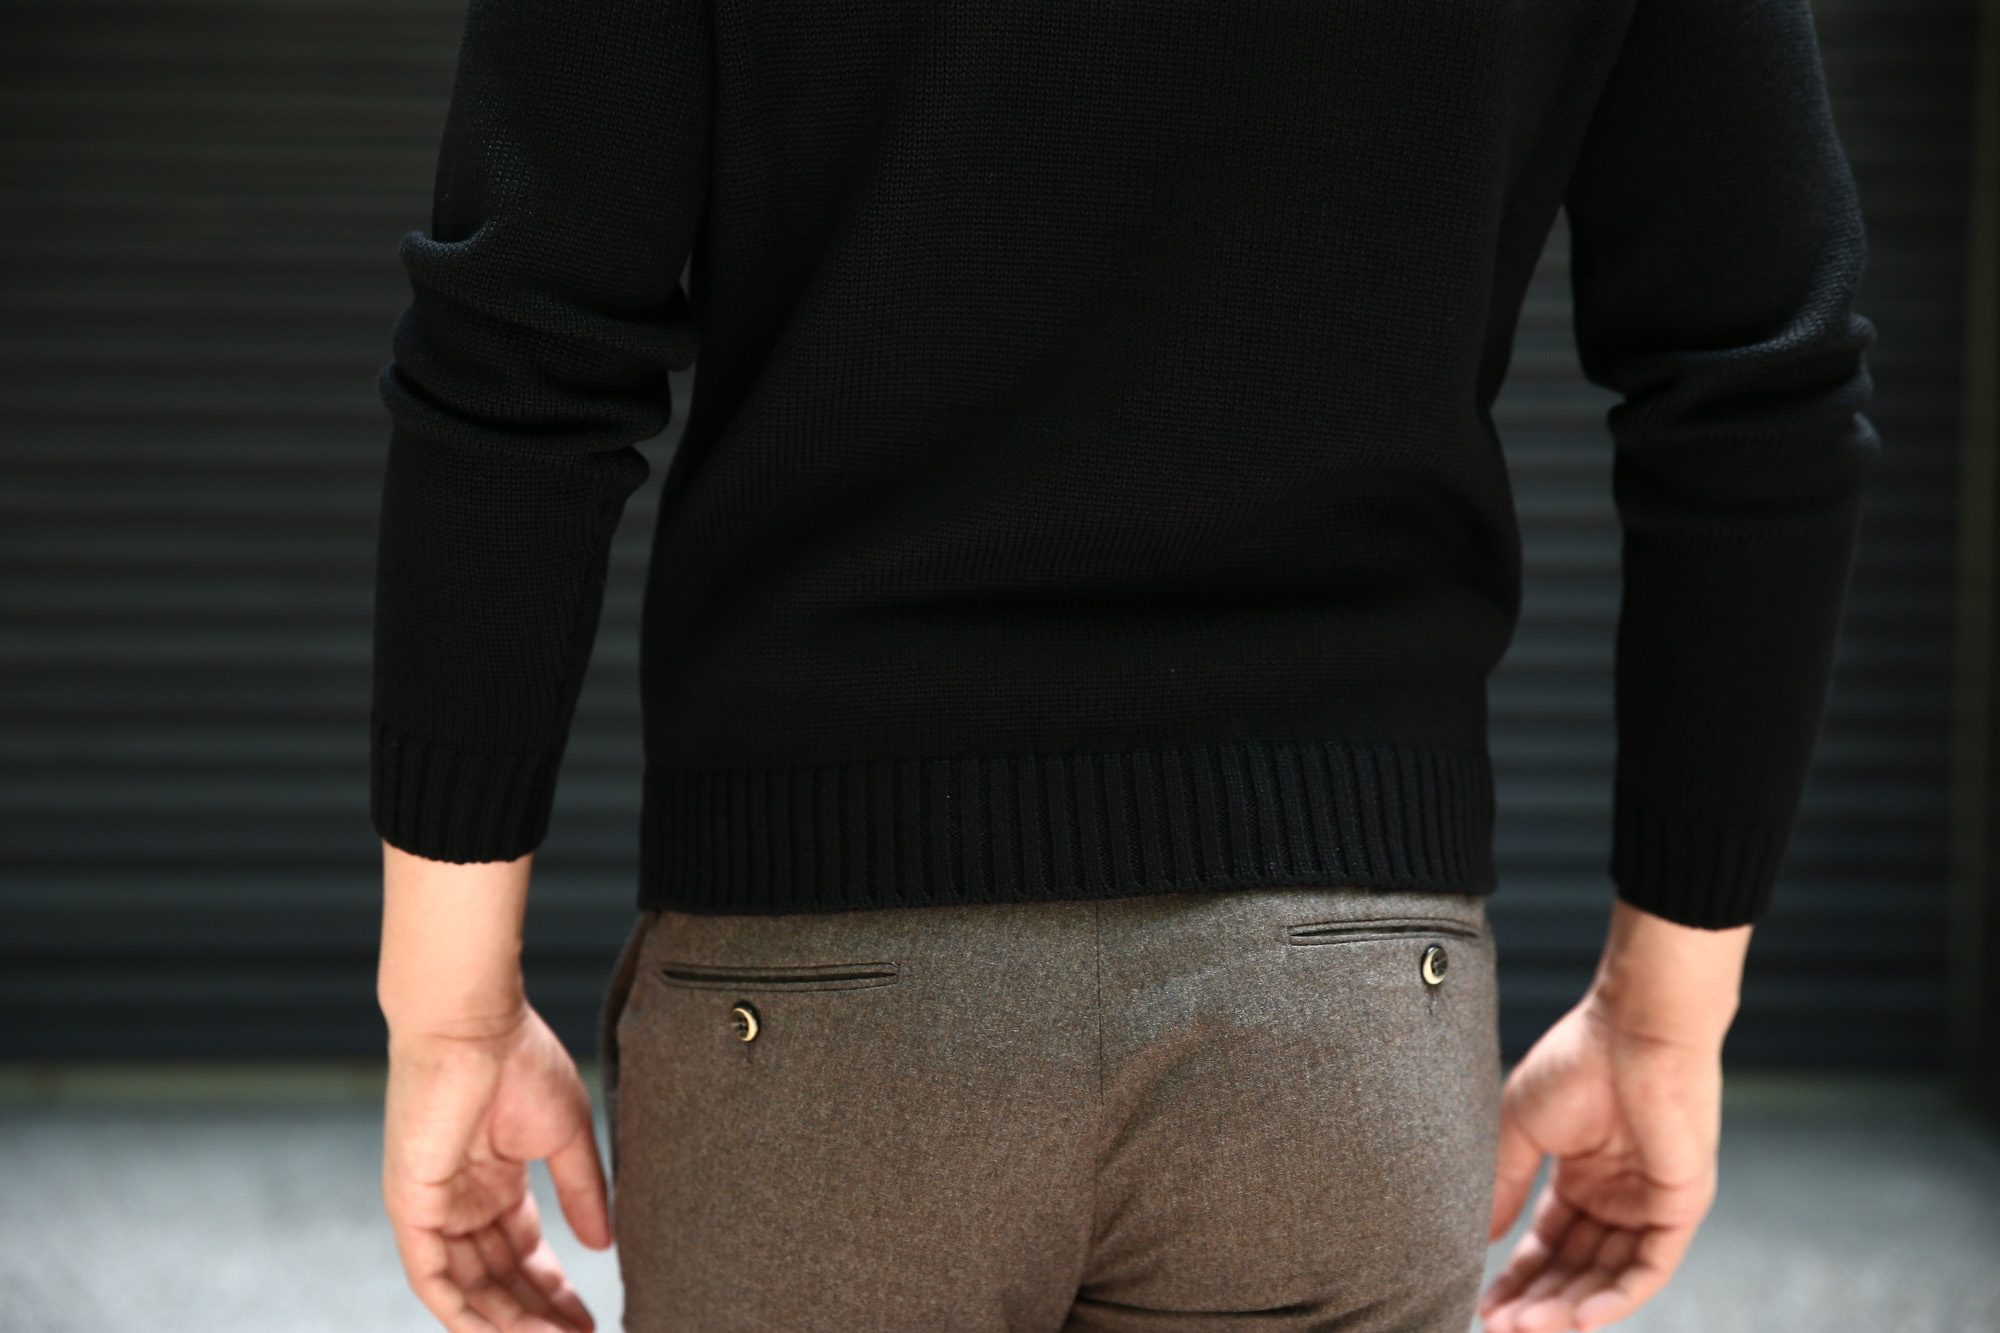 ZANONE (ザノーネ) Crew Neck Sweater (クルーネック セーター) VIRGIN WOOL 100% ミドルゲージ ウールニット セーター BLACK (ブラック・Z0015)  made in italy (イタリア製) 2018 秋冬新作 zanone 愛知 名古屋 Alto e Diritto アルト エ デリット alto e diritto アルトエデリット